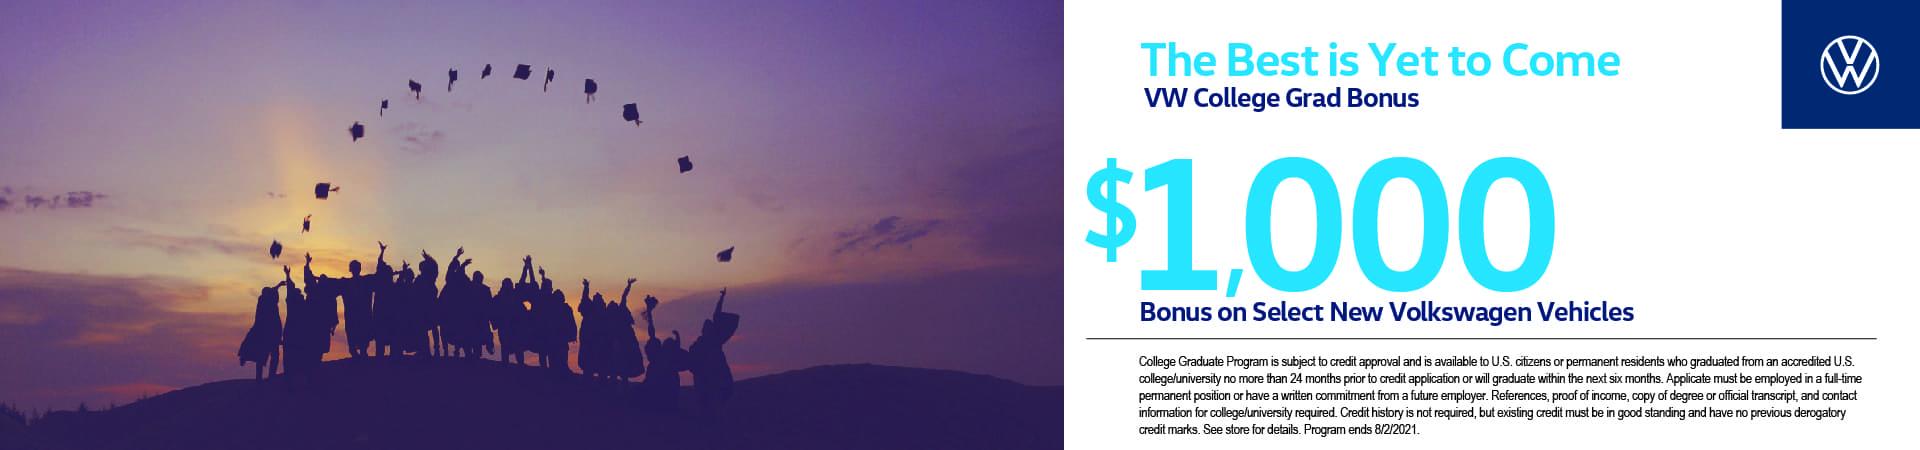 July-2021-VW-CS-Slides_1000-College-Grad-Rebate-2